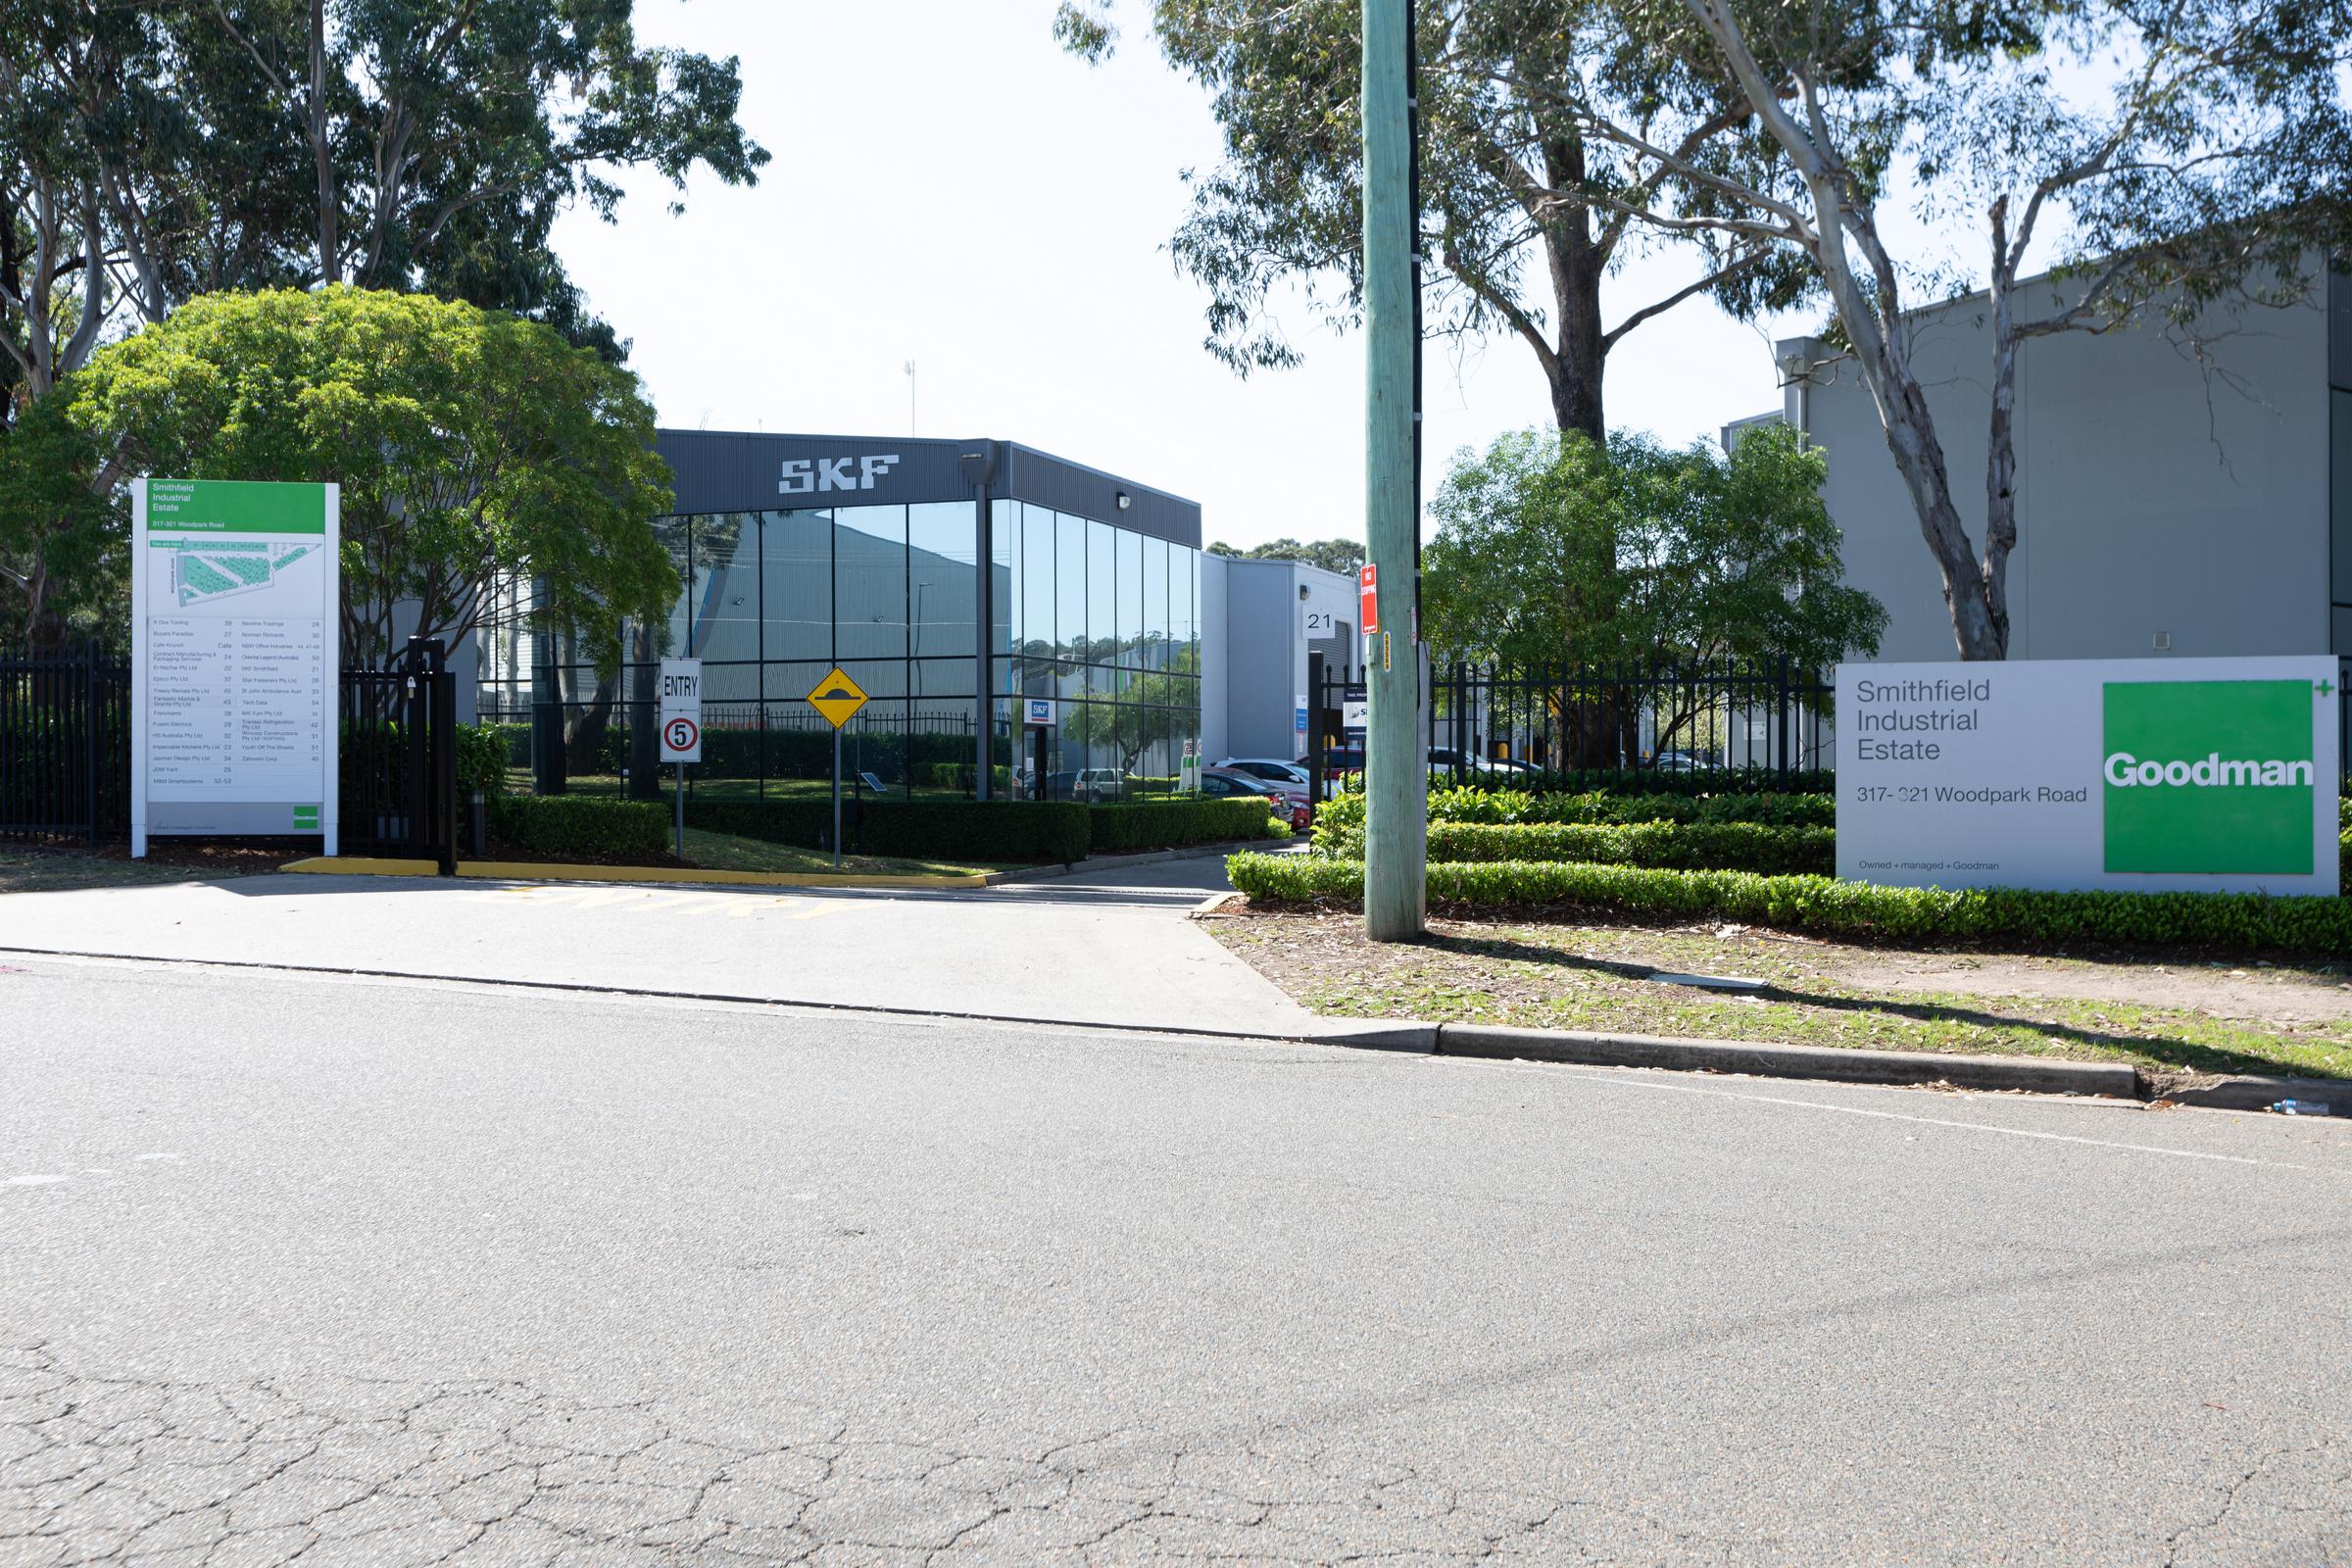 Goodman Property Services